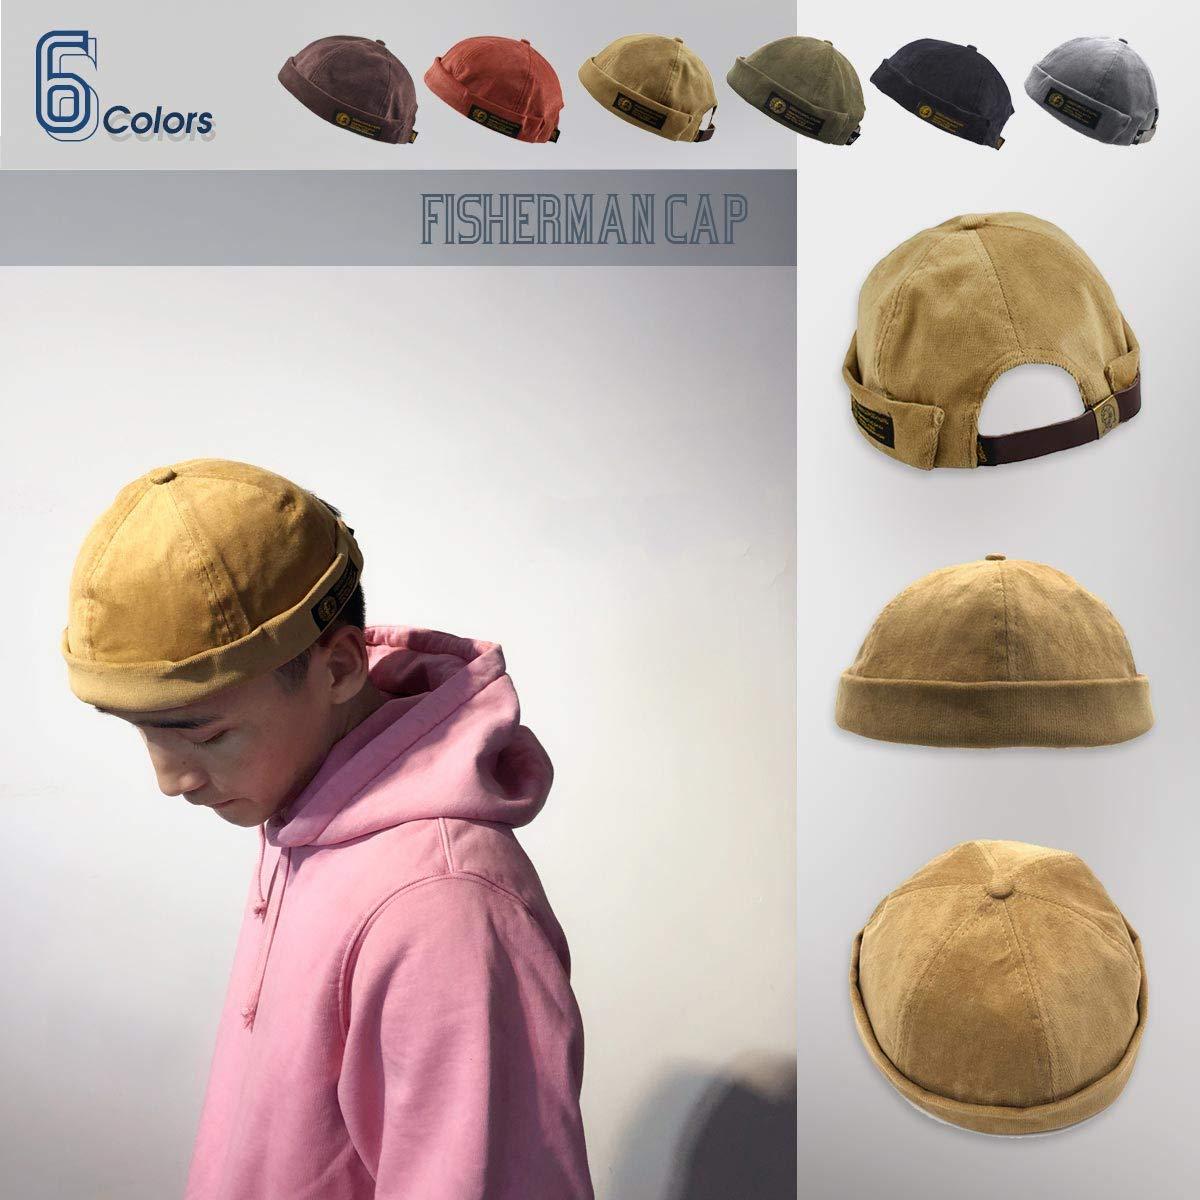 79636e238e1fd Amazon | 帽子 キャップ フィッシャーマンキャップ ロールキャップ サグキャップ ツバ無し メンズ レディース フィッシャーマンキャップ  おしゃれ 無地 セーラー帽 ...